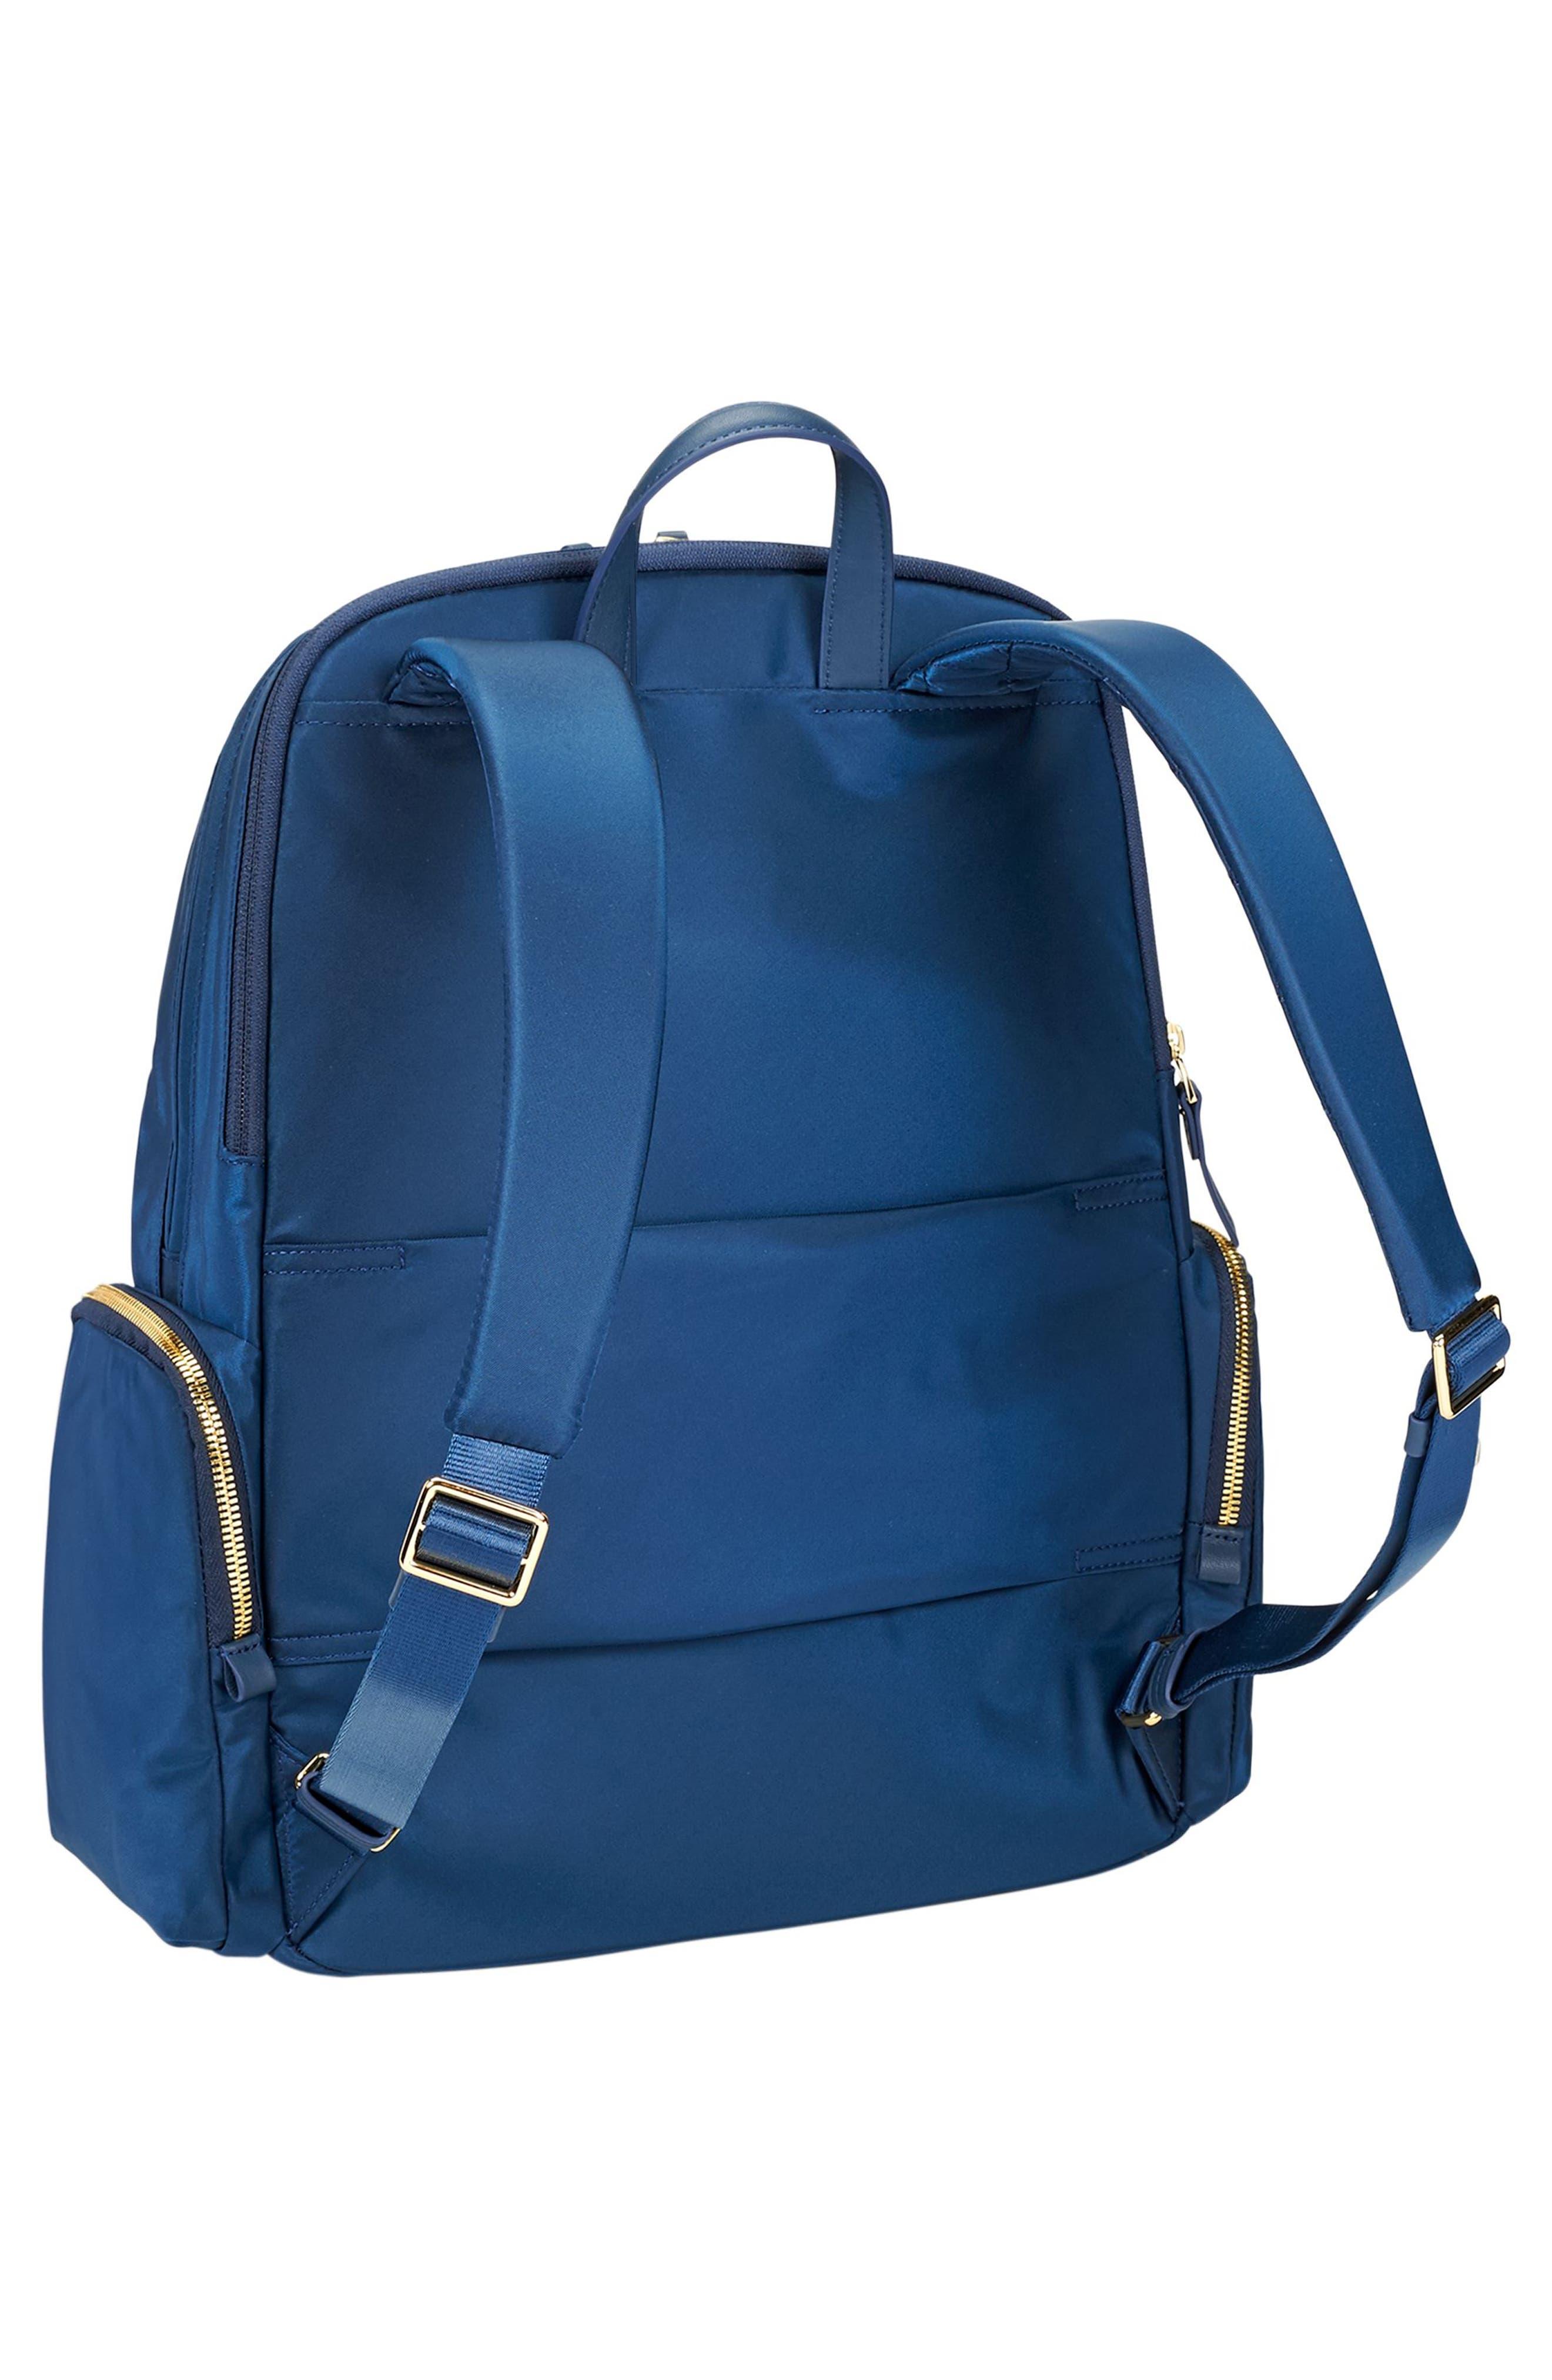 Calais Nylon 15-Inch Computer Commuter Backpack,                             Alternate thumbnail 47, color,